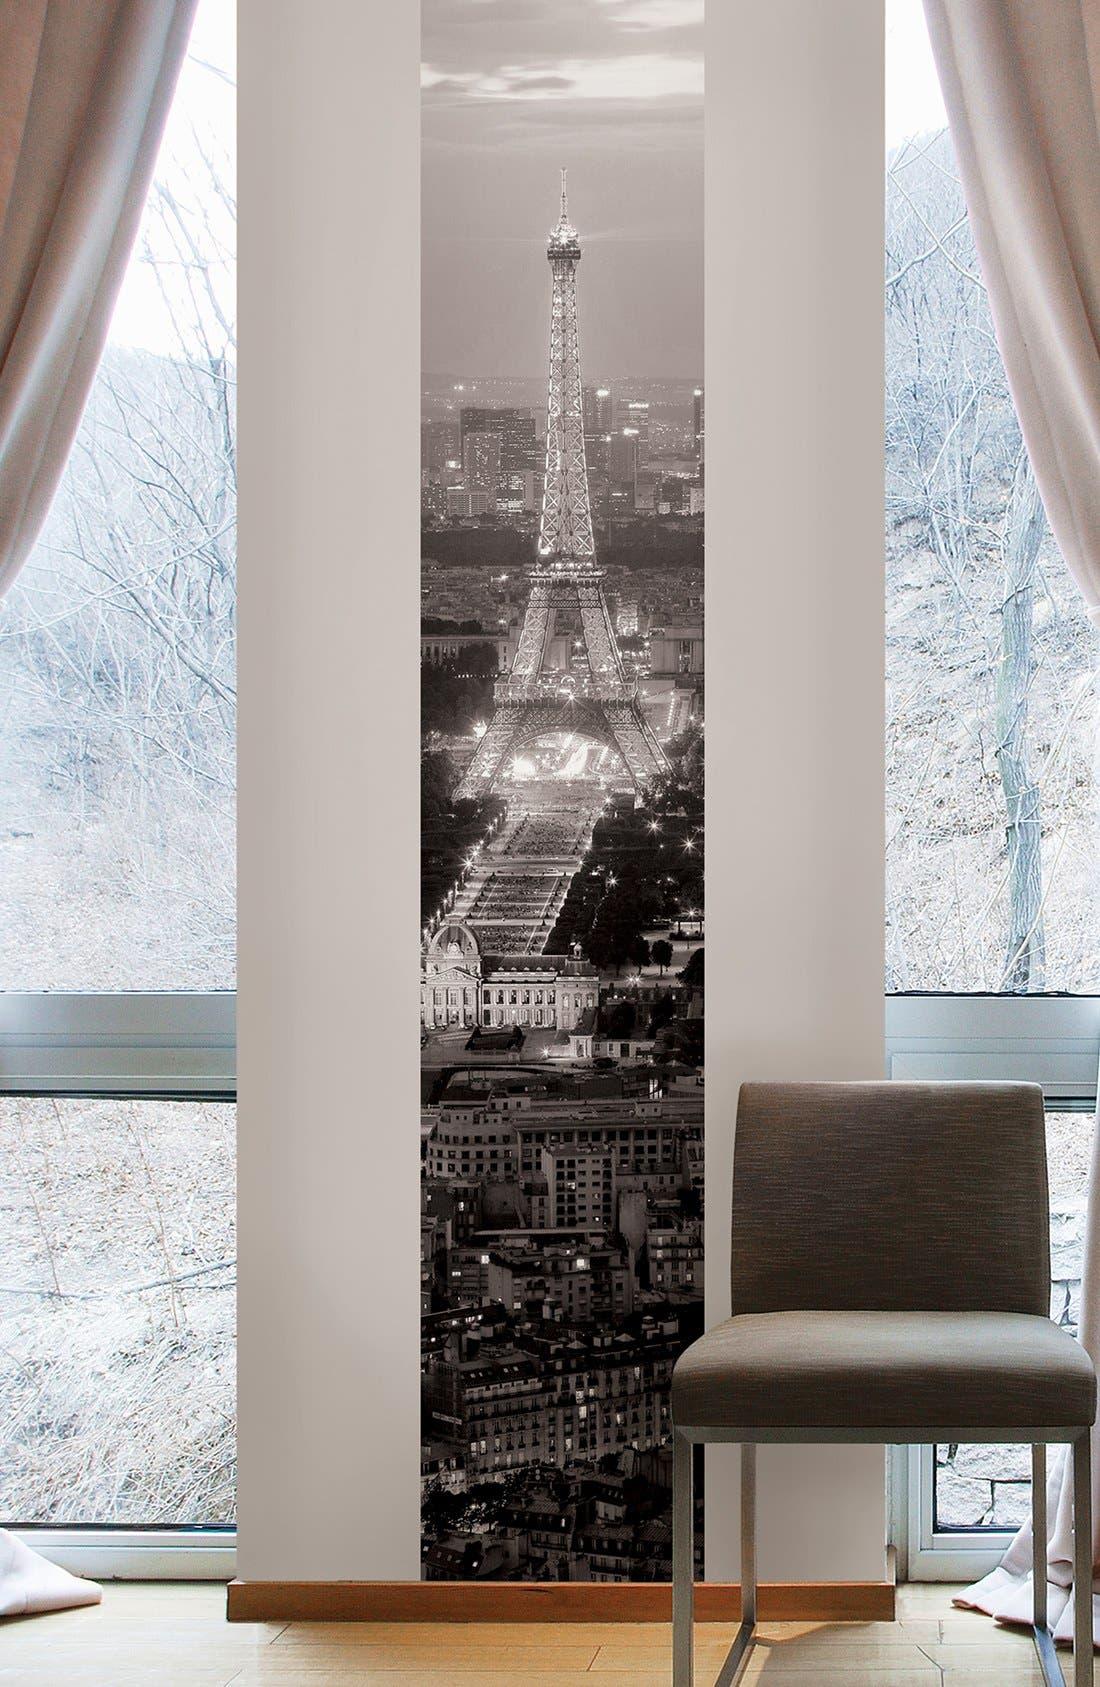 Alternate Image 1 Selected - Wallpops 'Paris' Wall Art